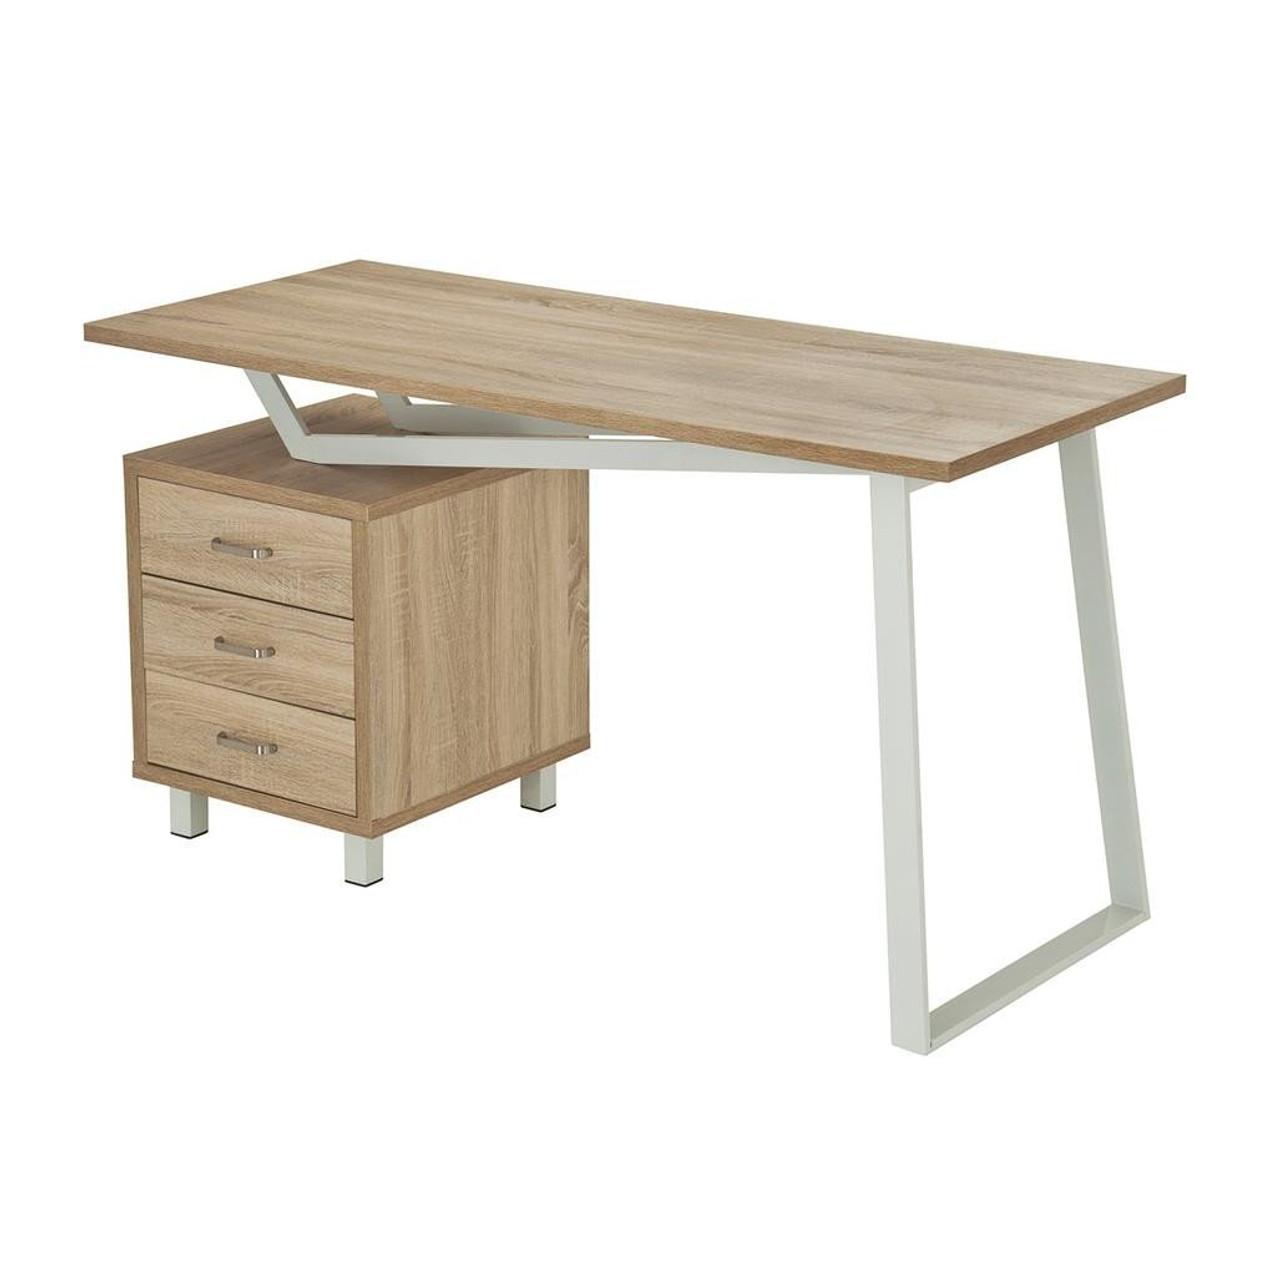 Techni Mobili Modern Design Computer Desk W Storage Sand Rta 2333 Snd